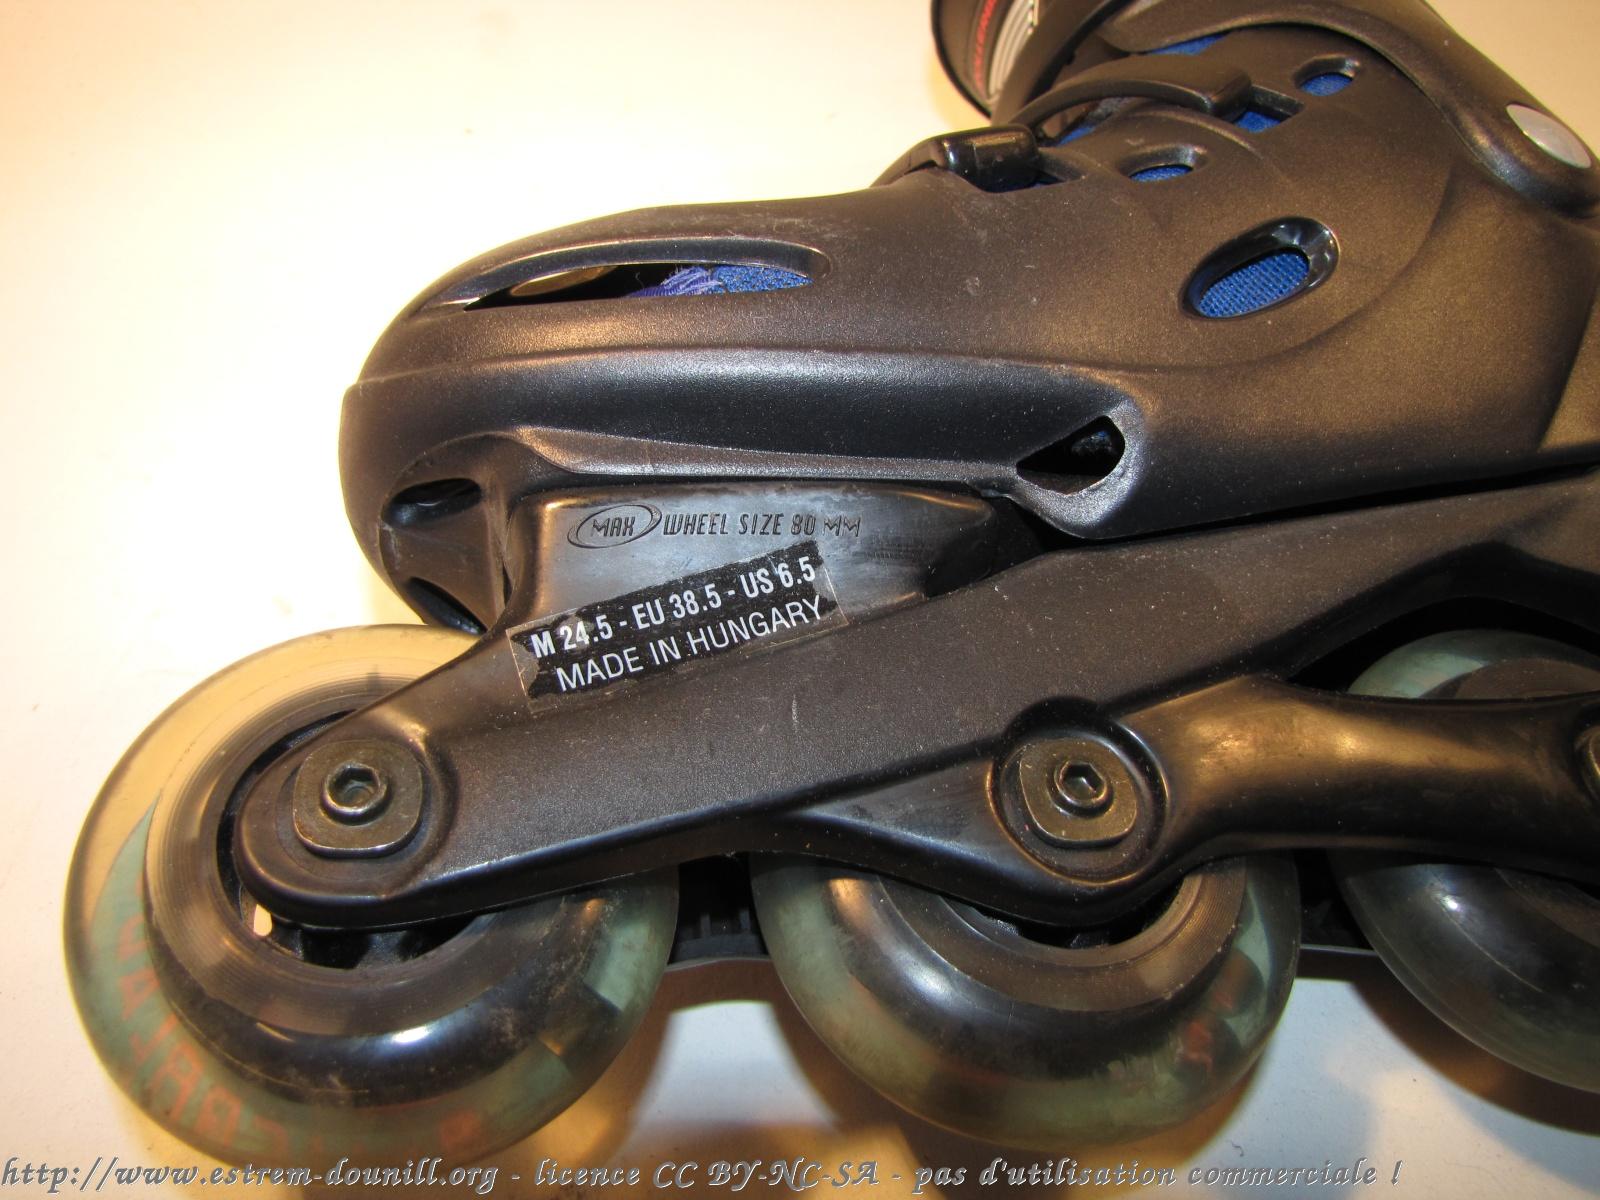 rollerblade_macro__made_in_hungary